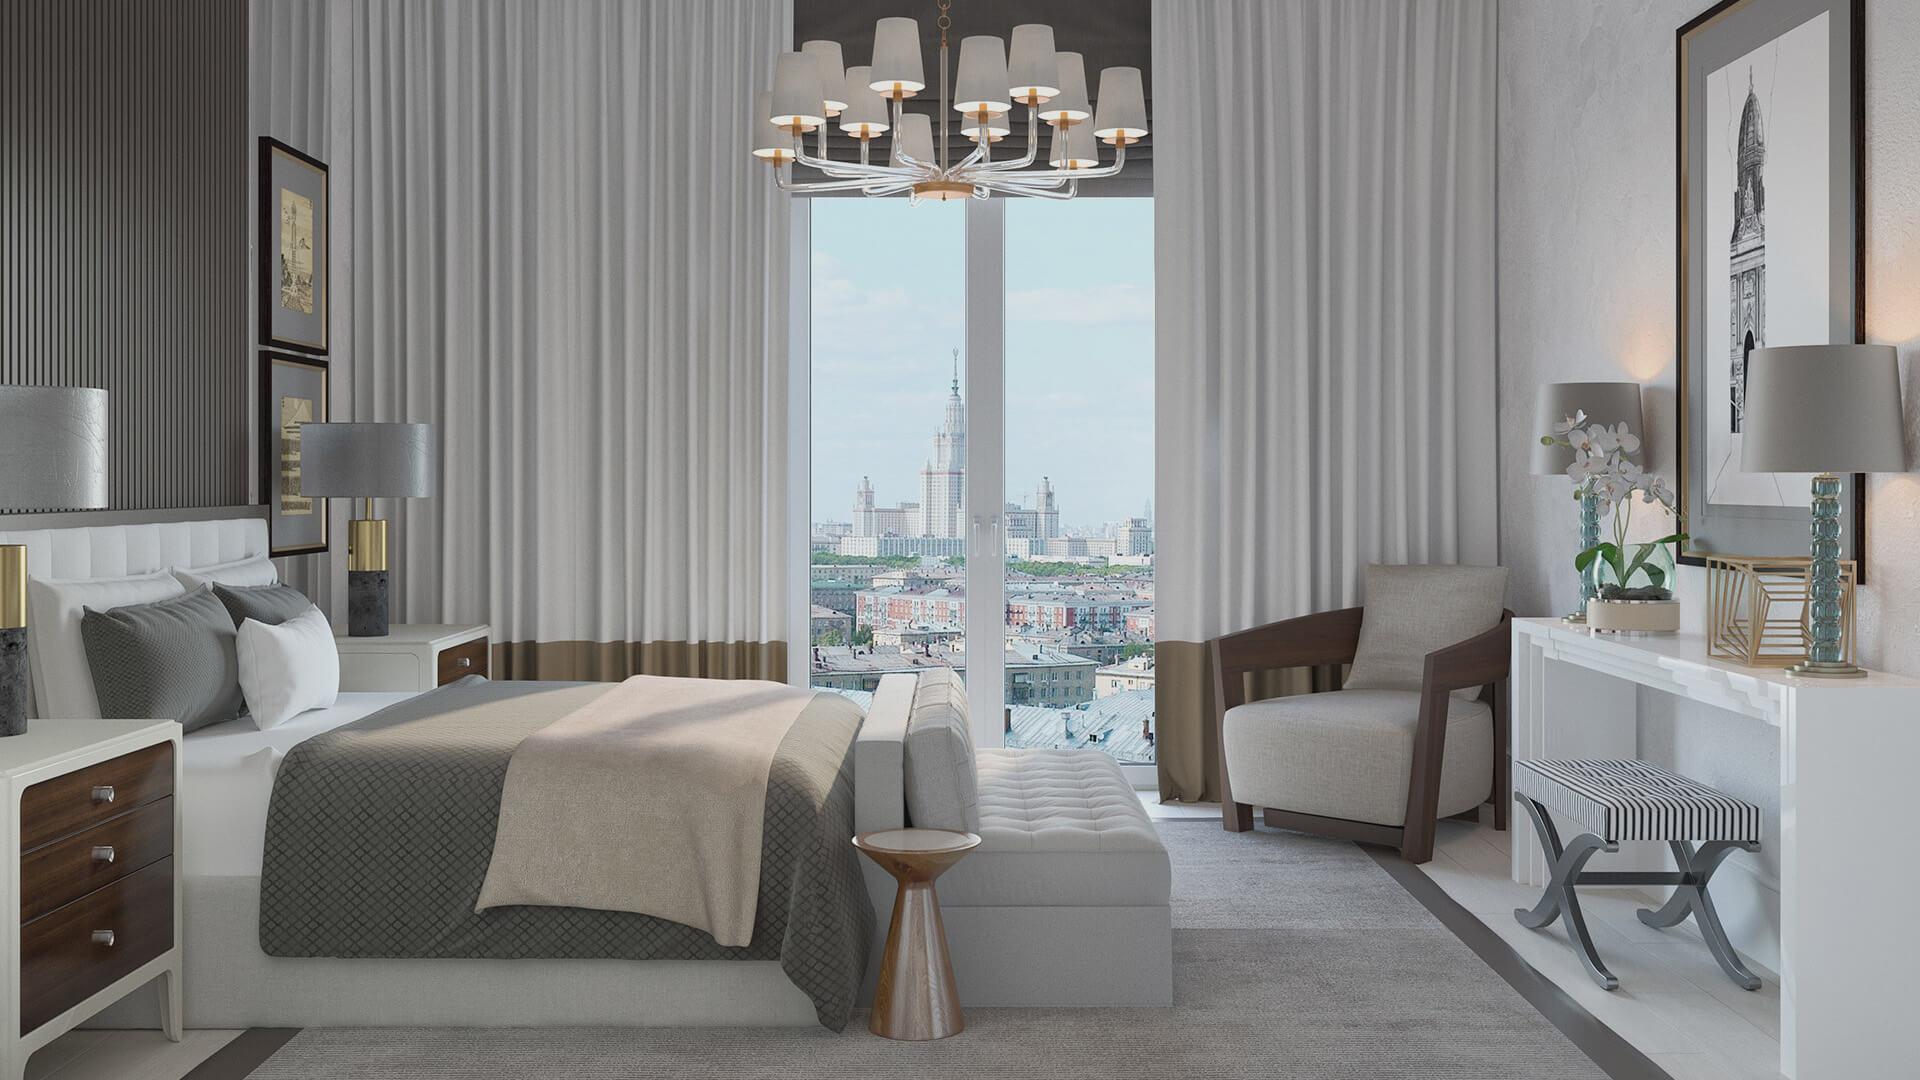 Интерьер спальни, вариант 2, вид 2